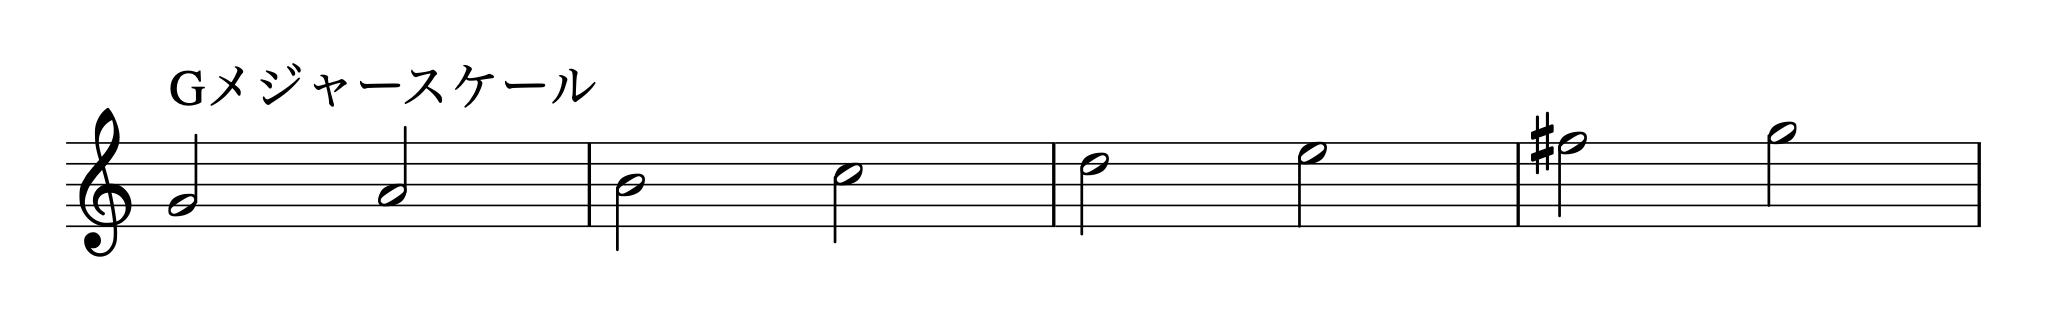 Gmajor-scale